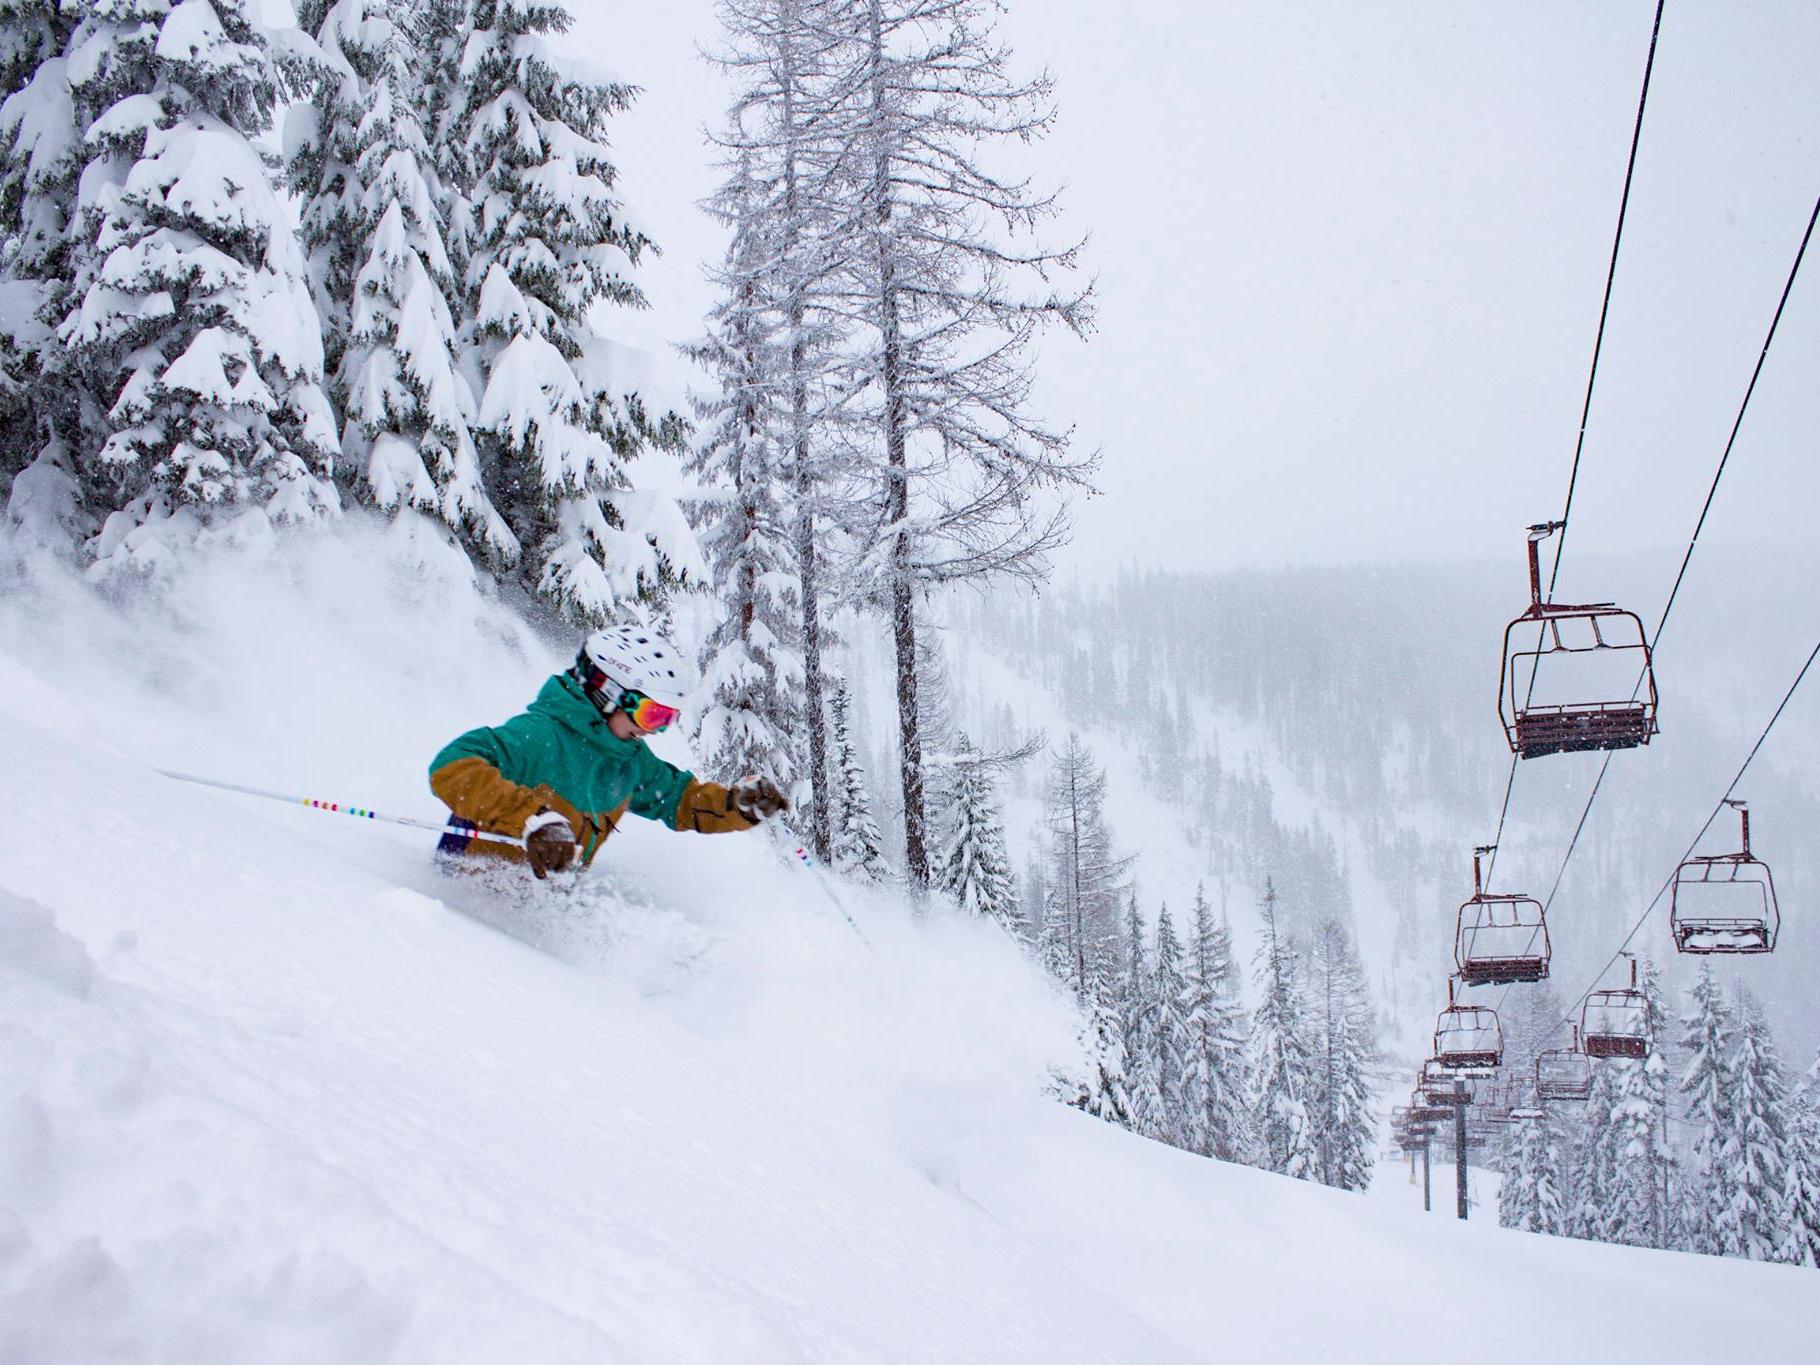 Liberty Skis Genesis 106 Women's Freeride and Powder Ski